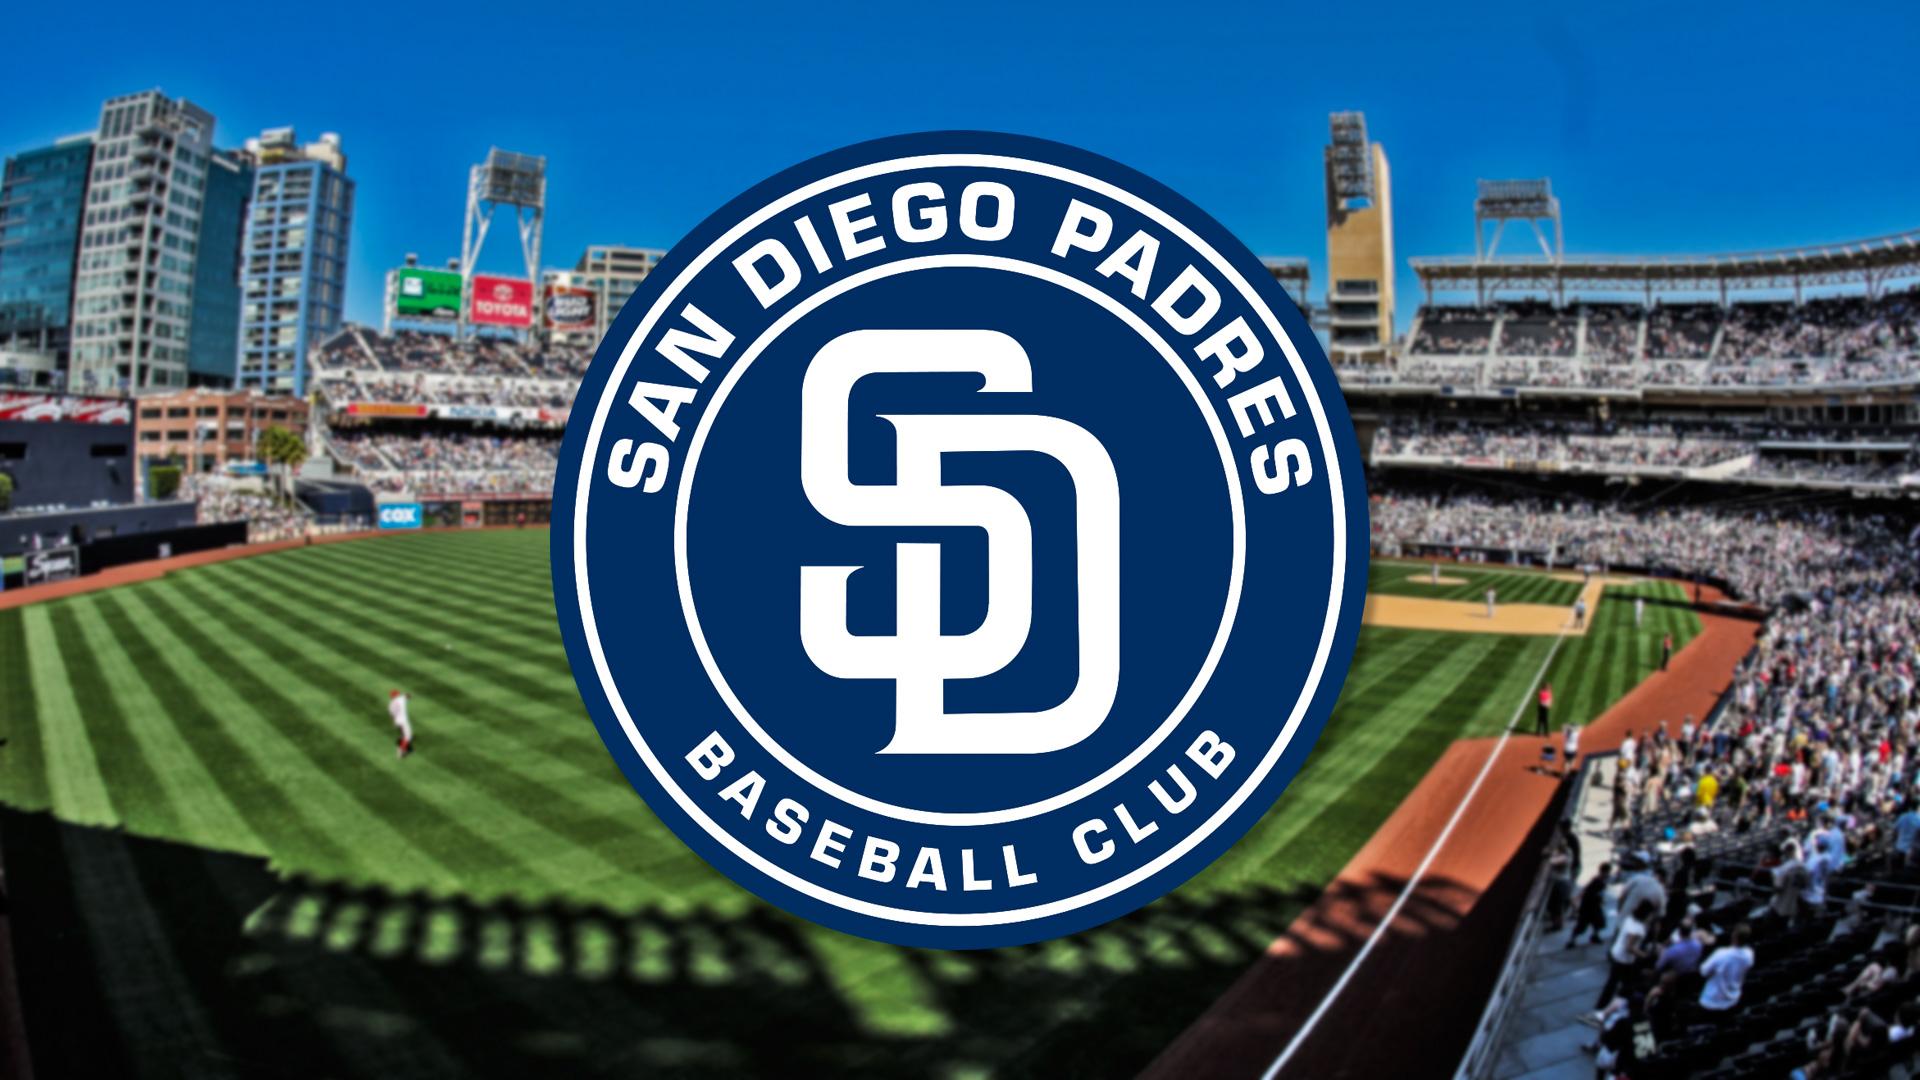 San Diego Padres Wallpaper Hd 1920x1080 Download Hd Wallpaper Wallpapertip